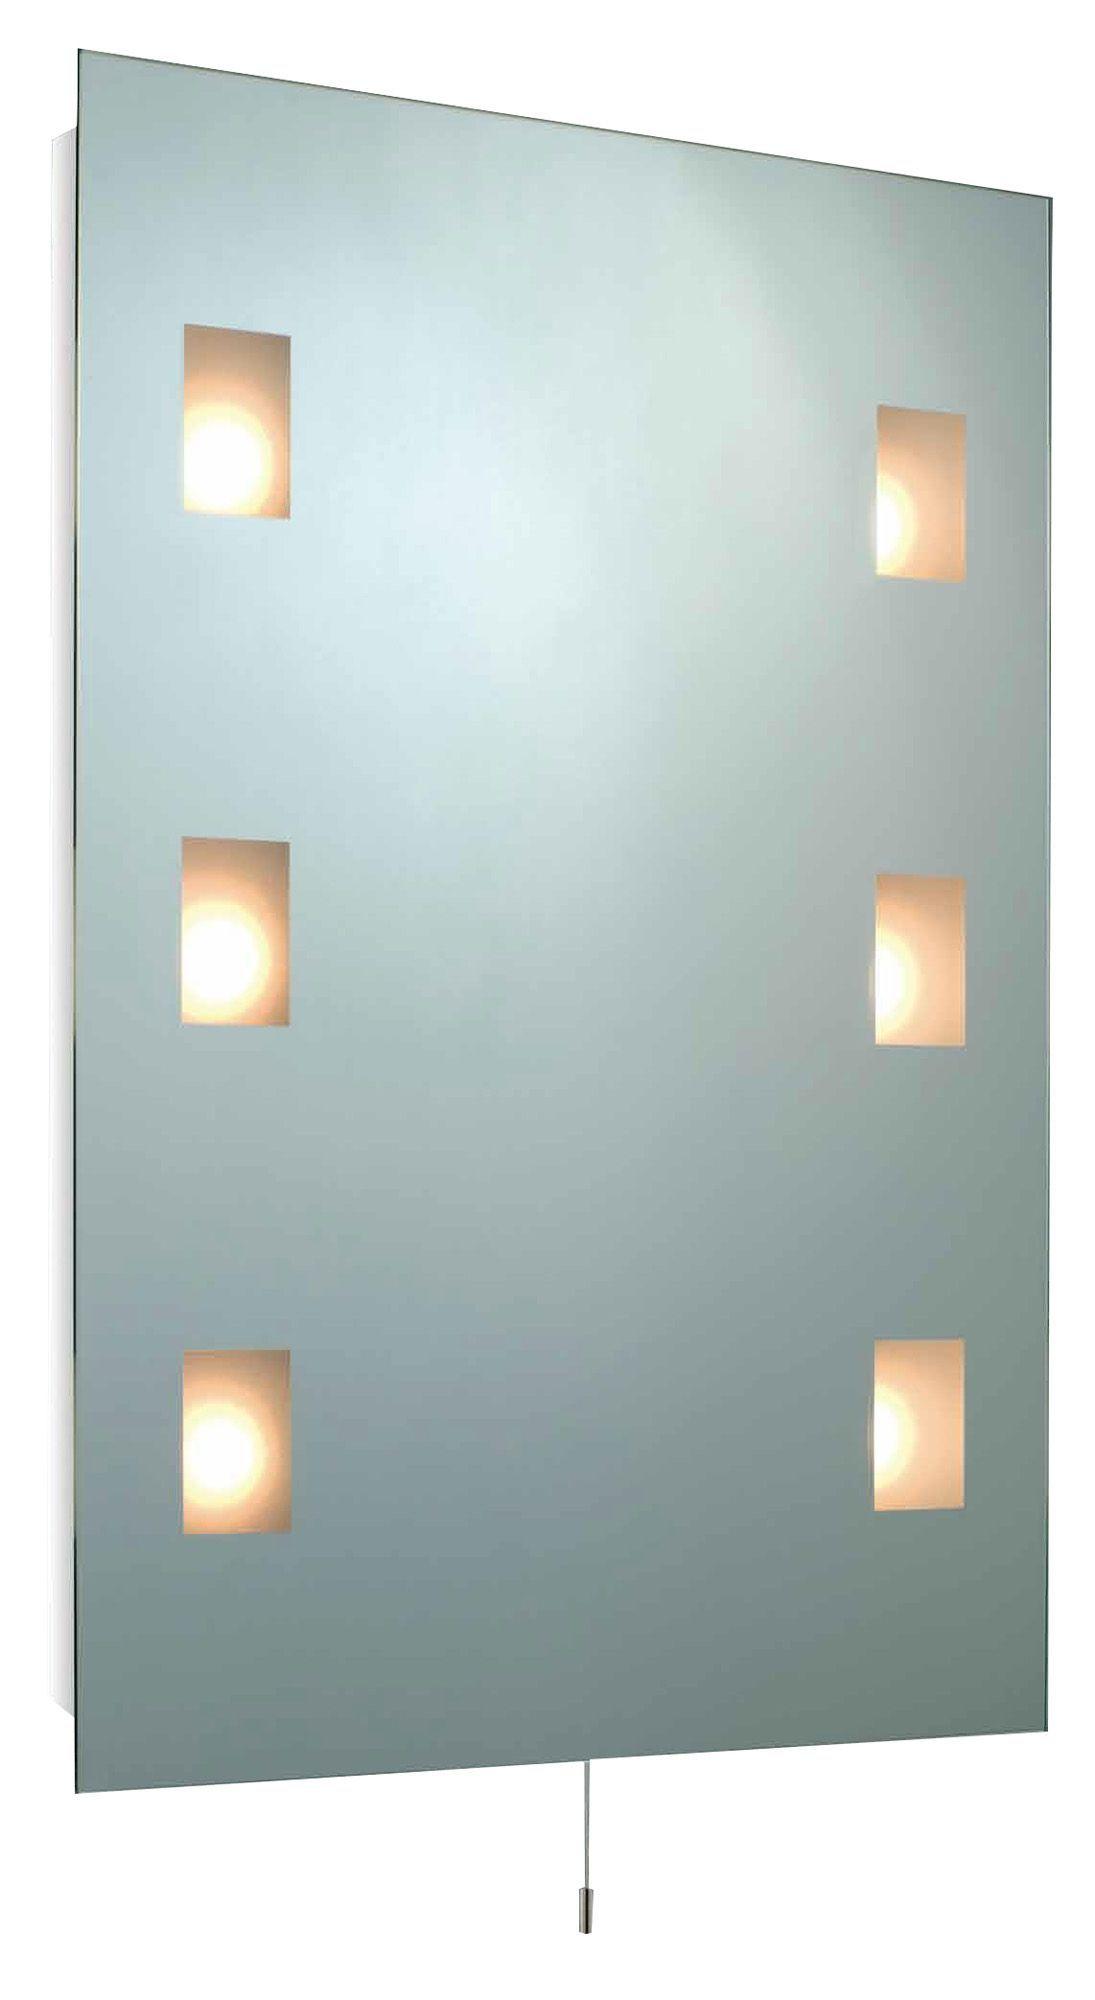 Bq Enlighten Illuminated Rectangular Mirror W580mm H780mm